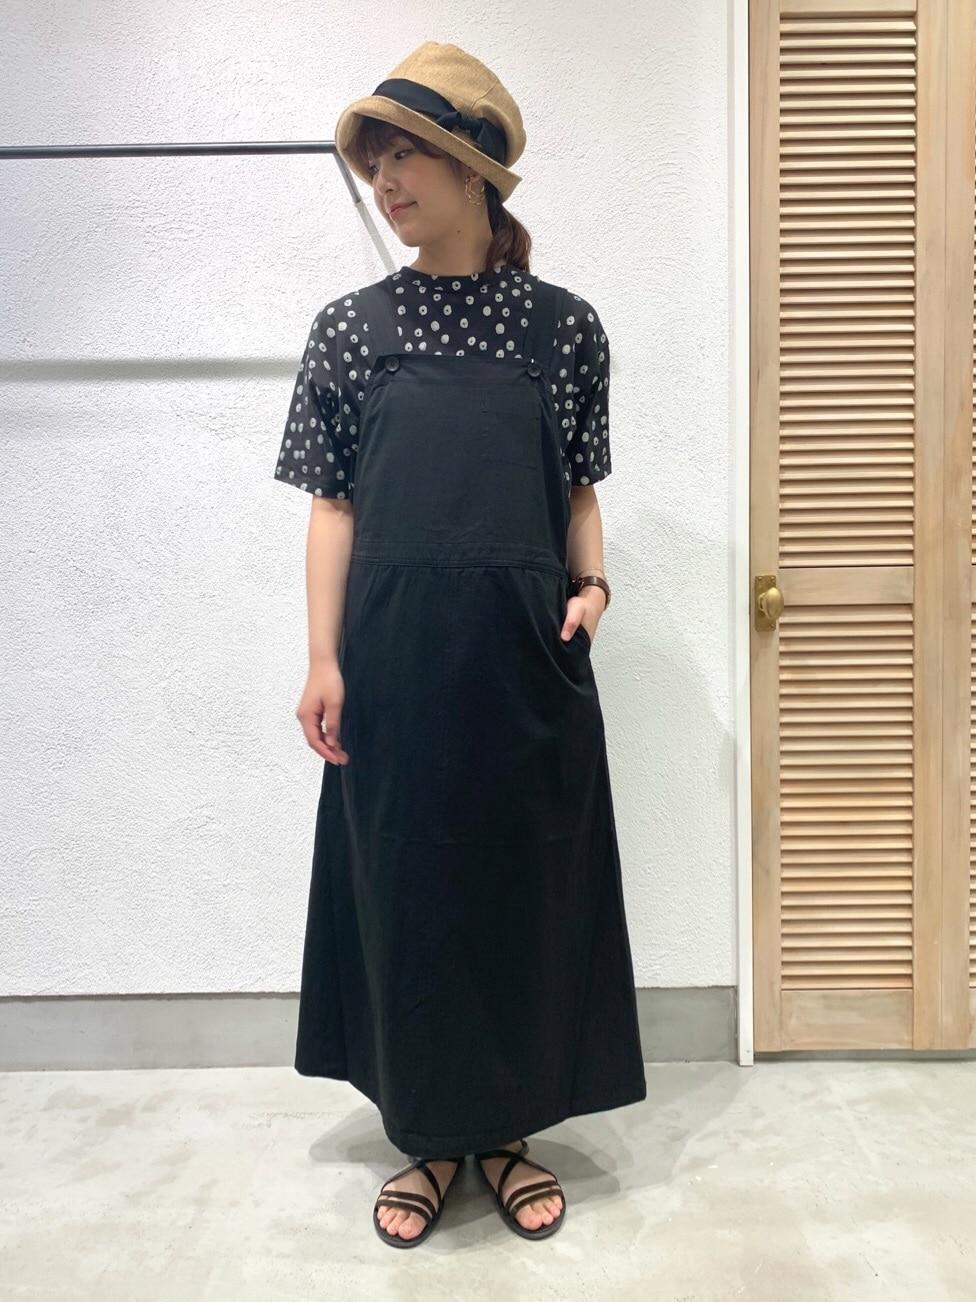 chambre de charme 横浜ジョイナス 身長:162cm 2020.08.23